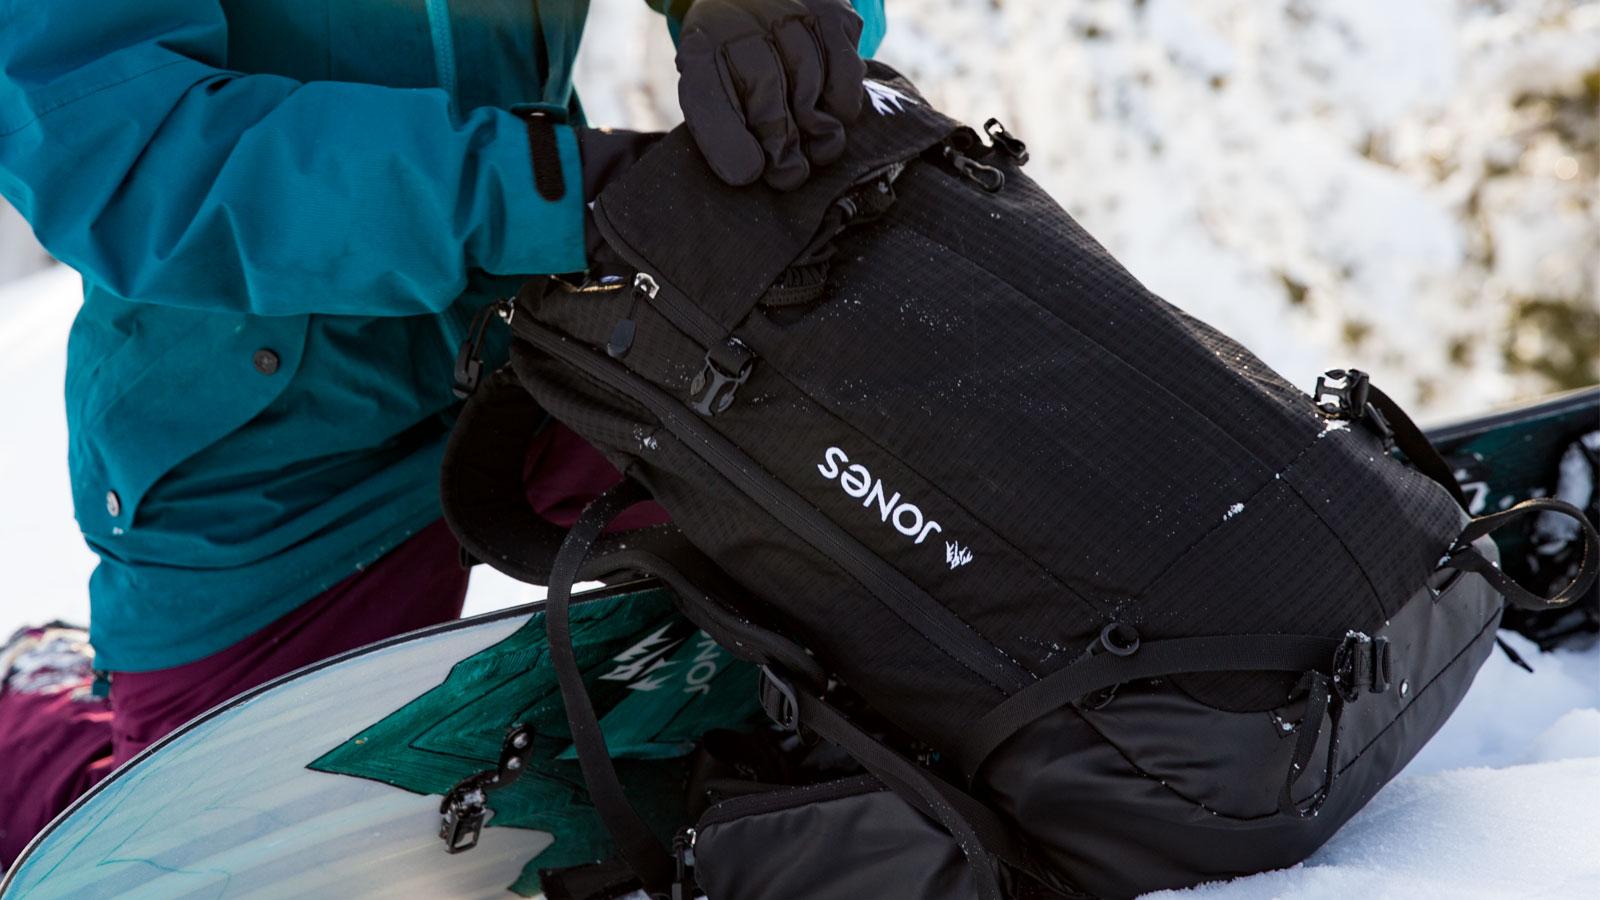 JONES Technical Backpack FW1920